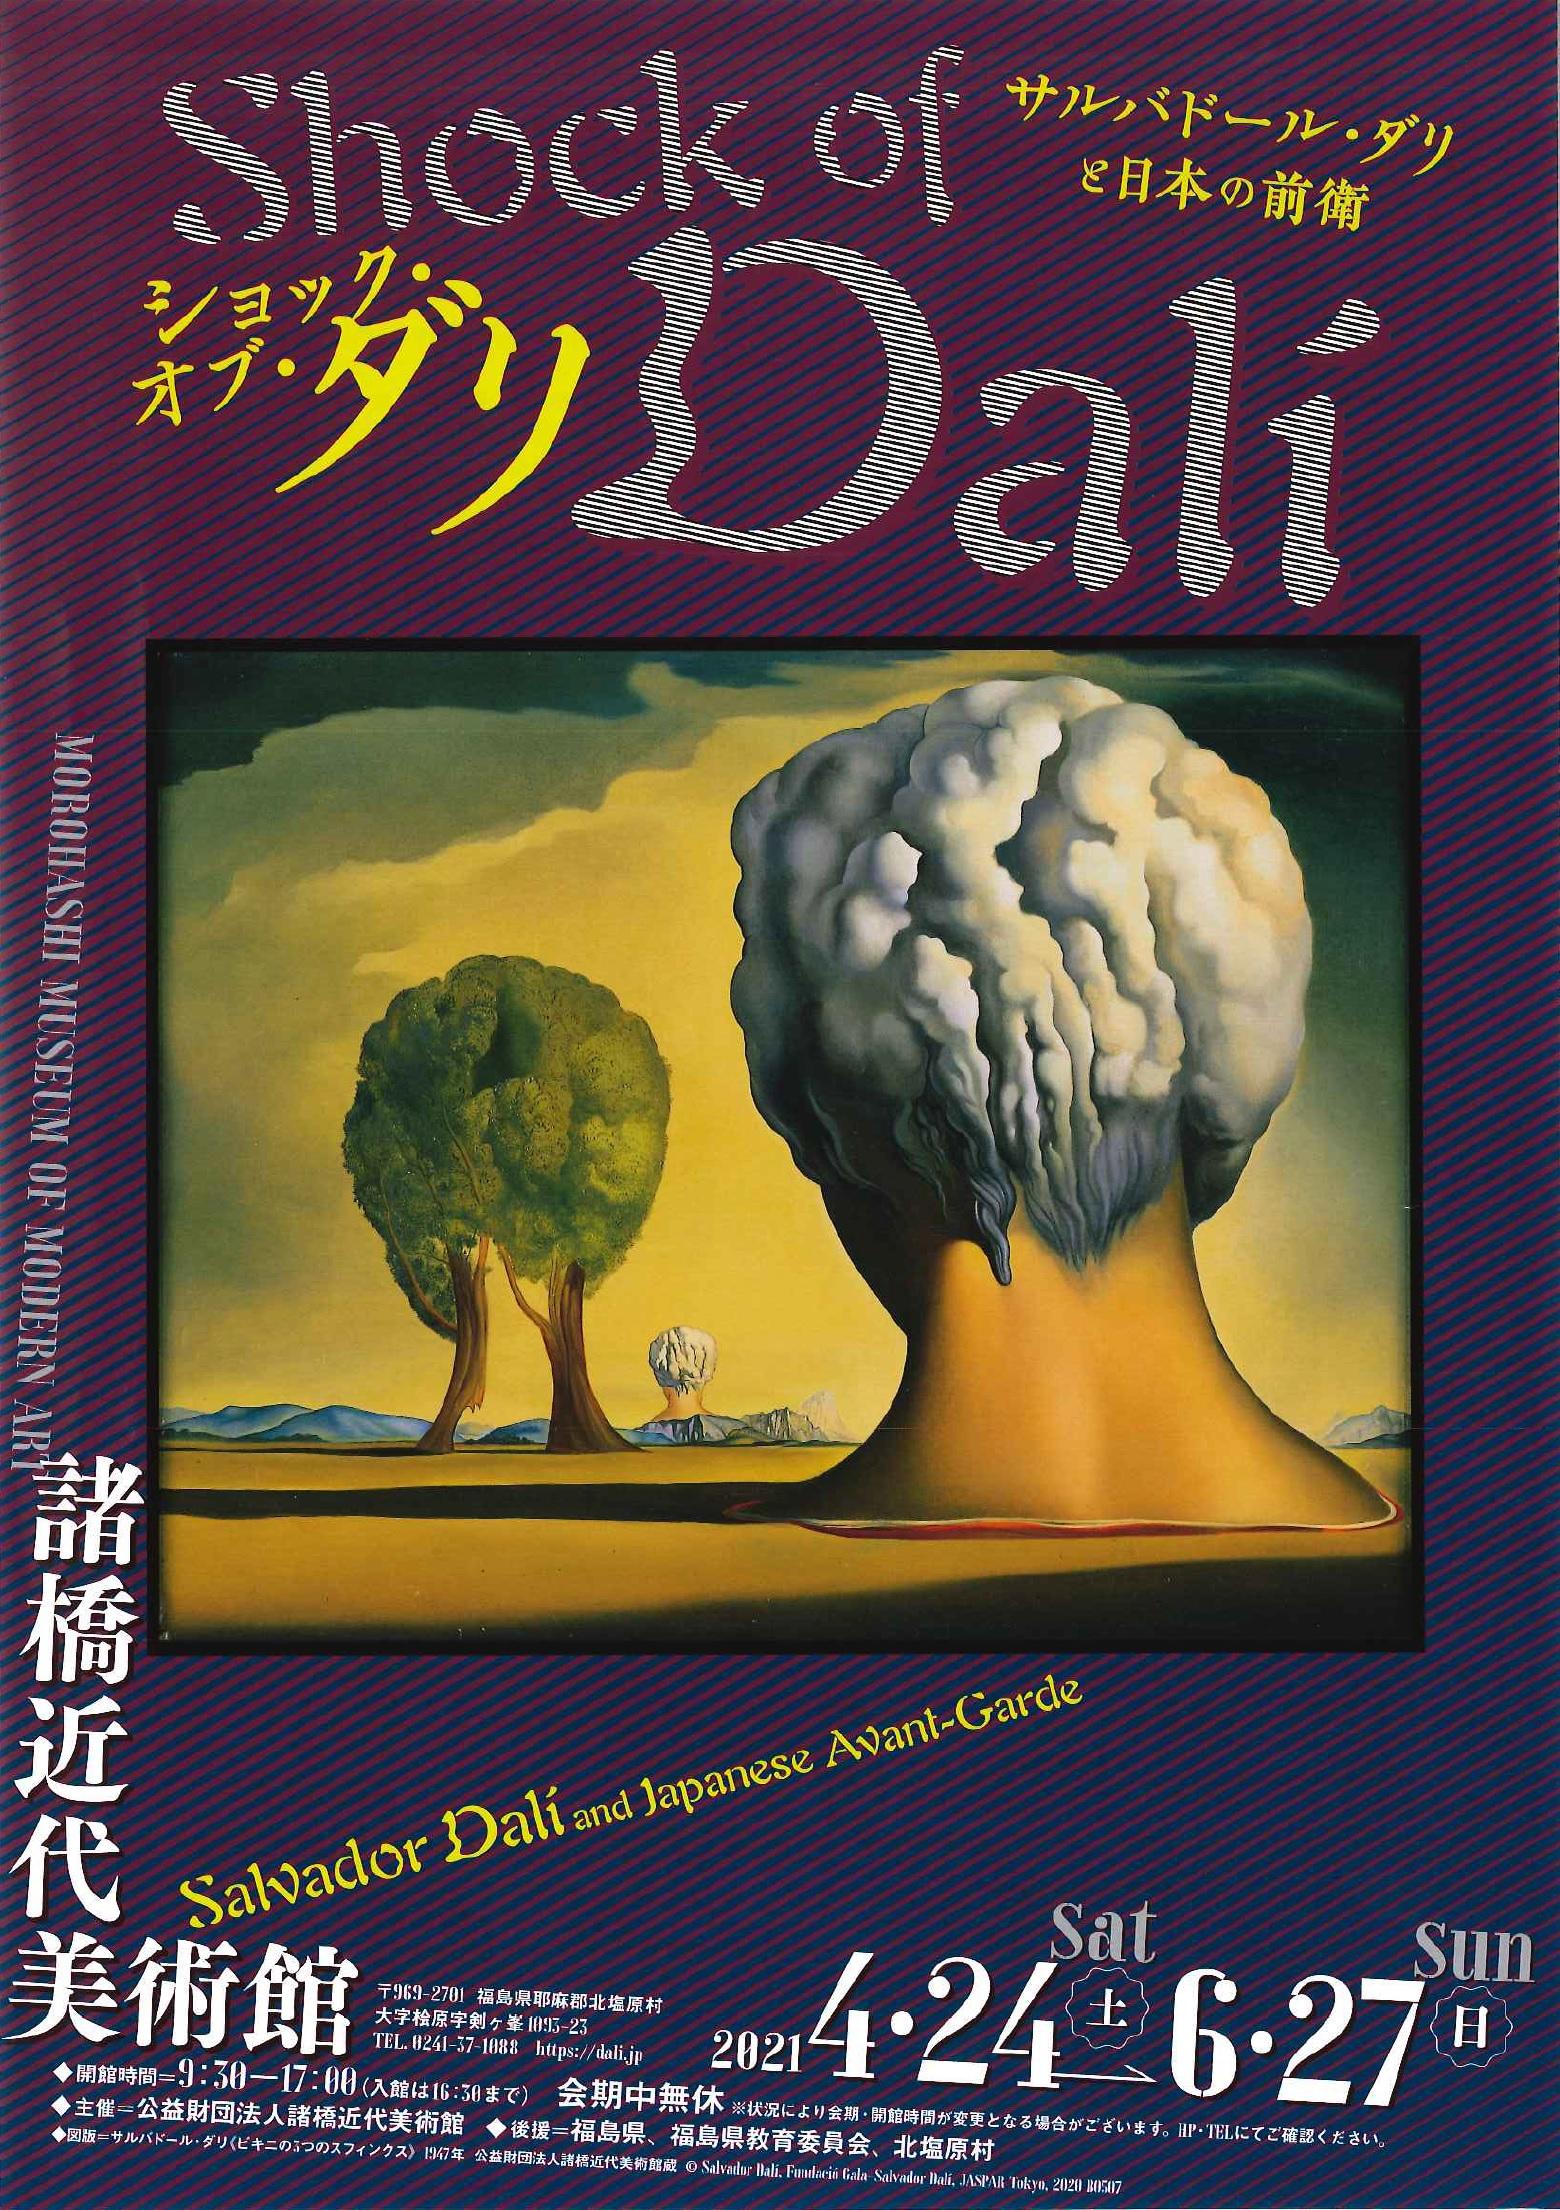 4/24~6/27「Shock of Dalí ショック・オブ・ダリ 〜サルバドール・ダリと日本の前衛〜」開催!!